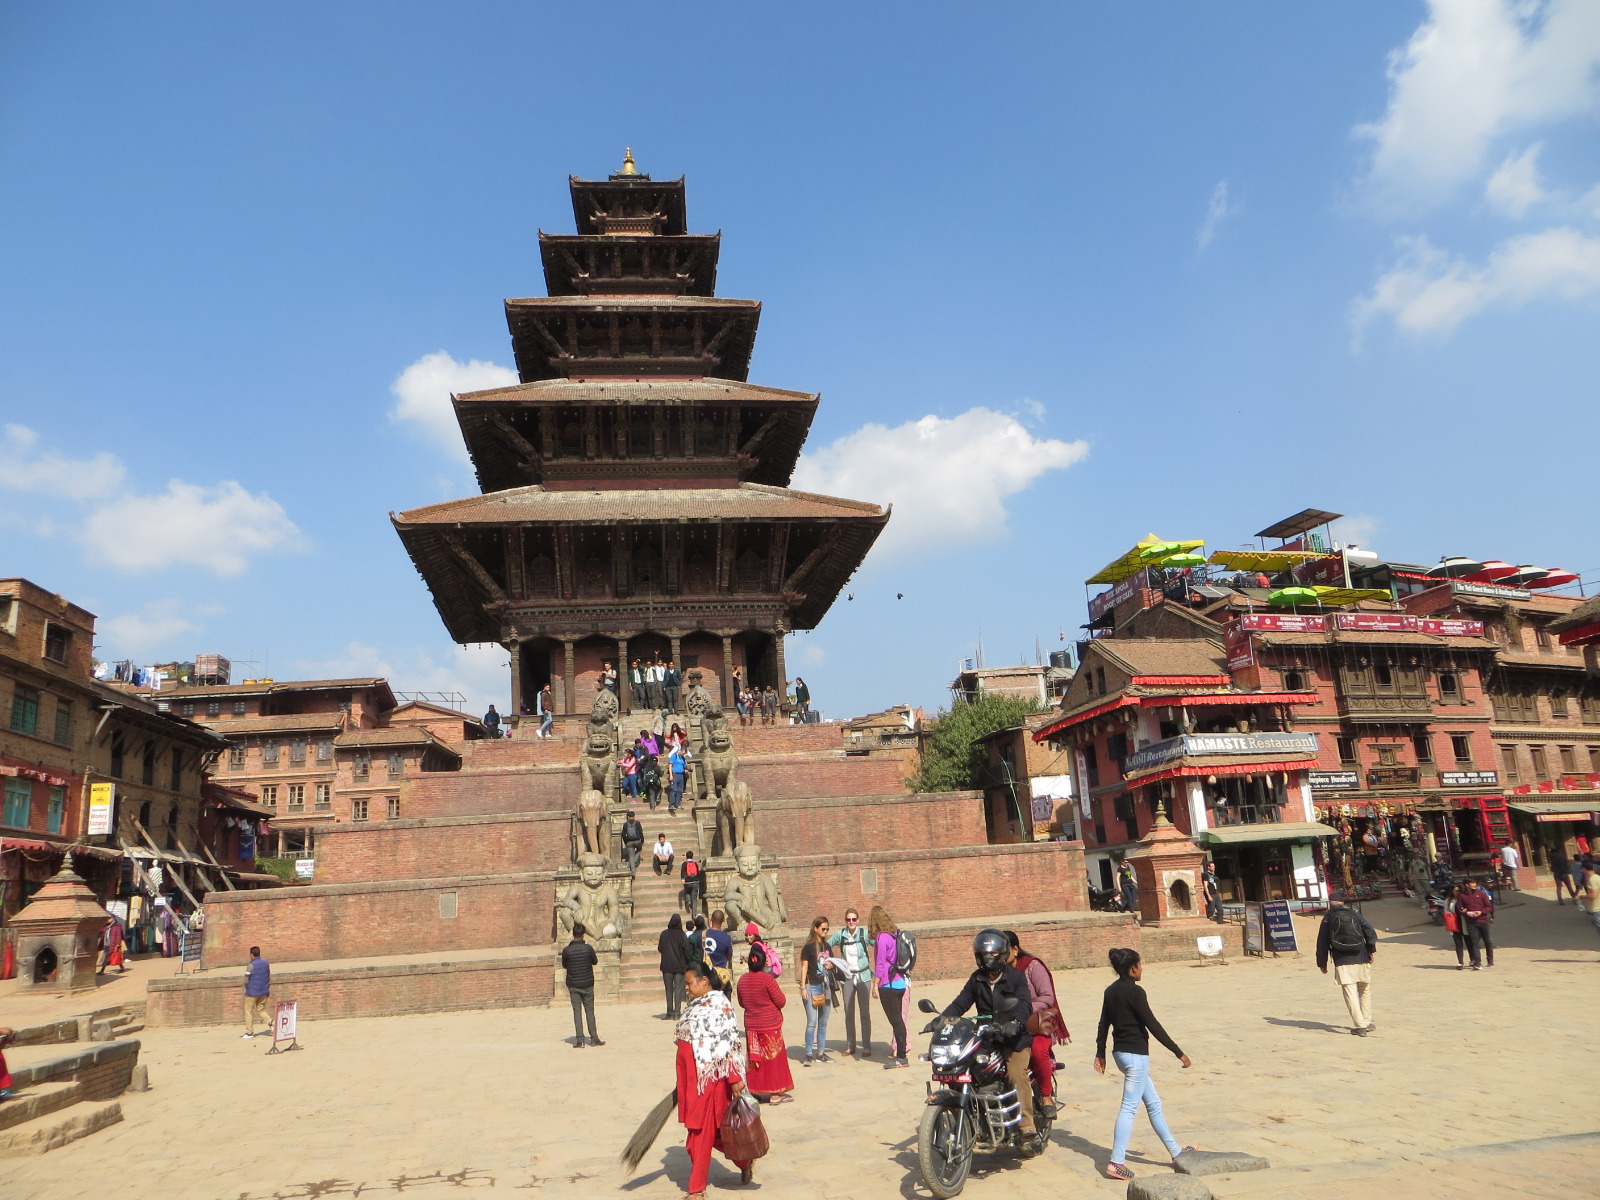 https://www.eberhardt-travel.de/reisebilder/reisetipp/kathmandu-nepals-hauptstadt-zwei-jahre-nach-dem-erdbeben/original/1500682